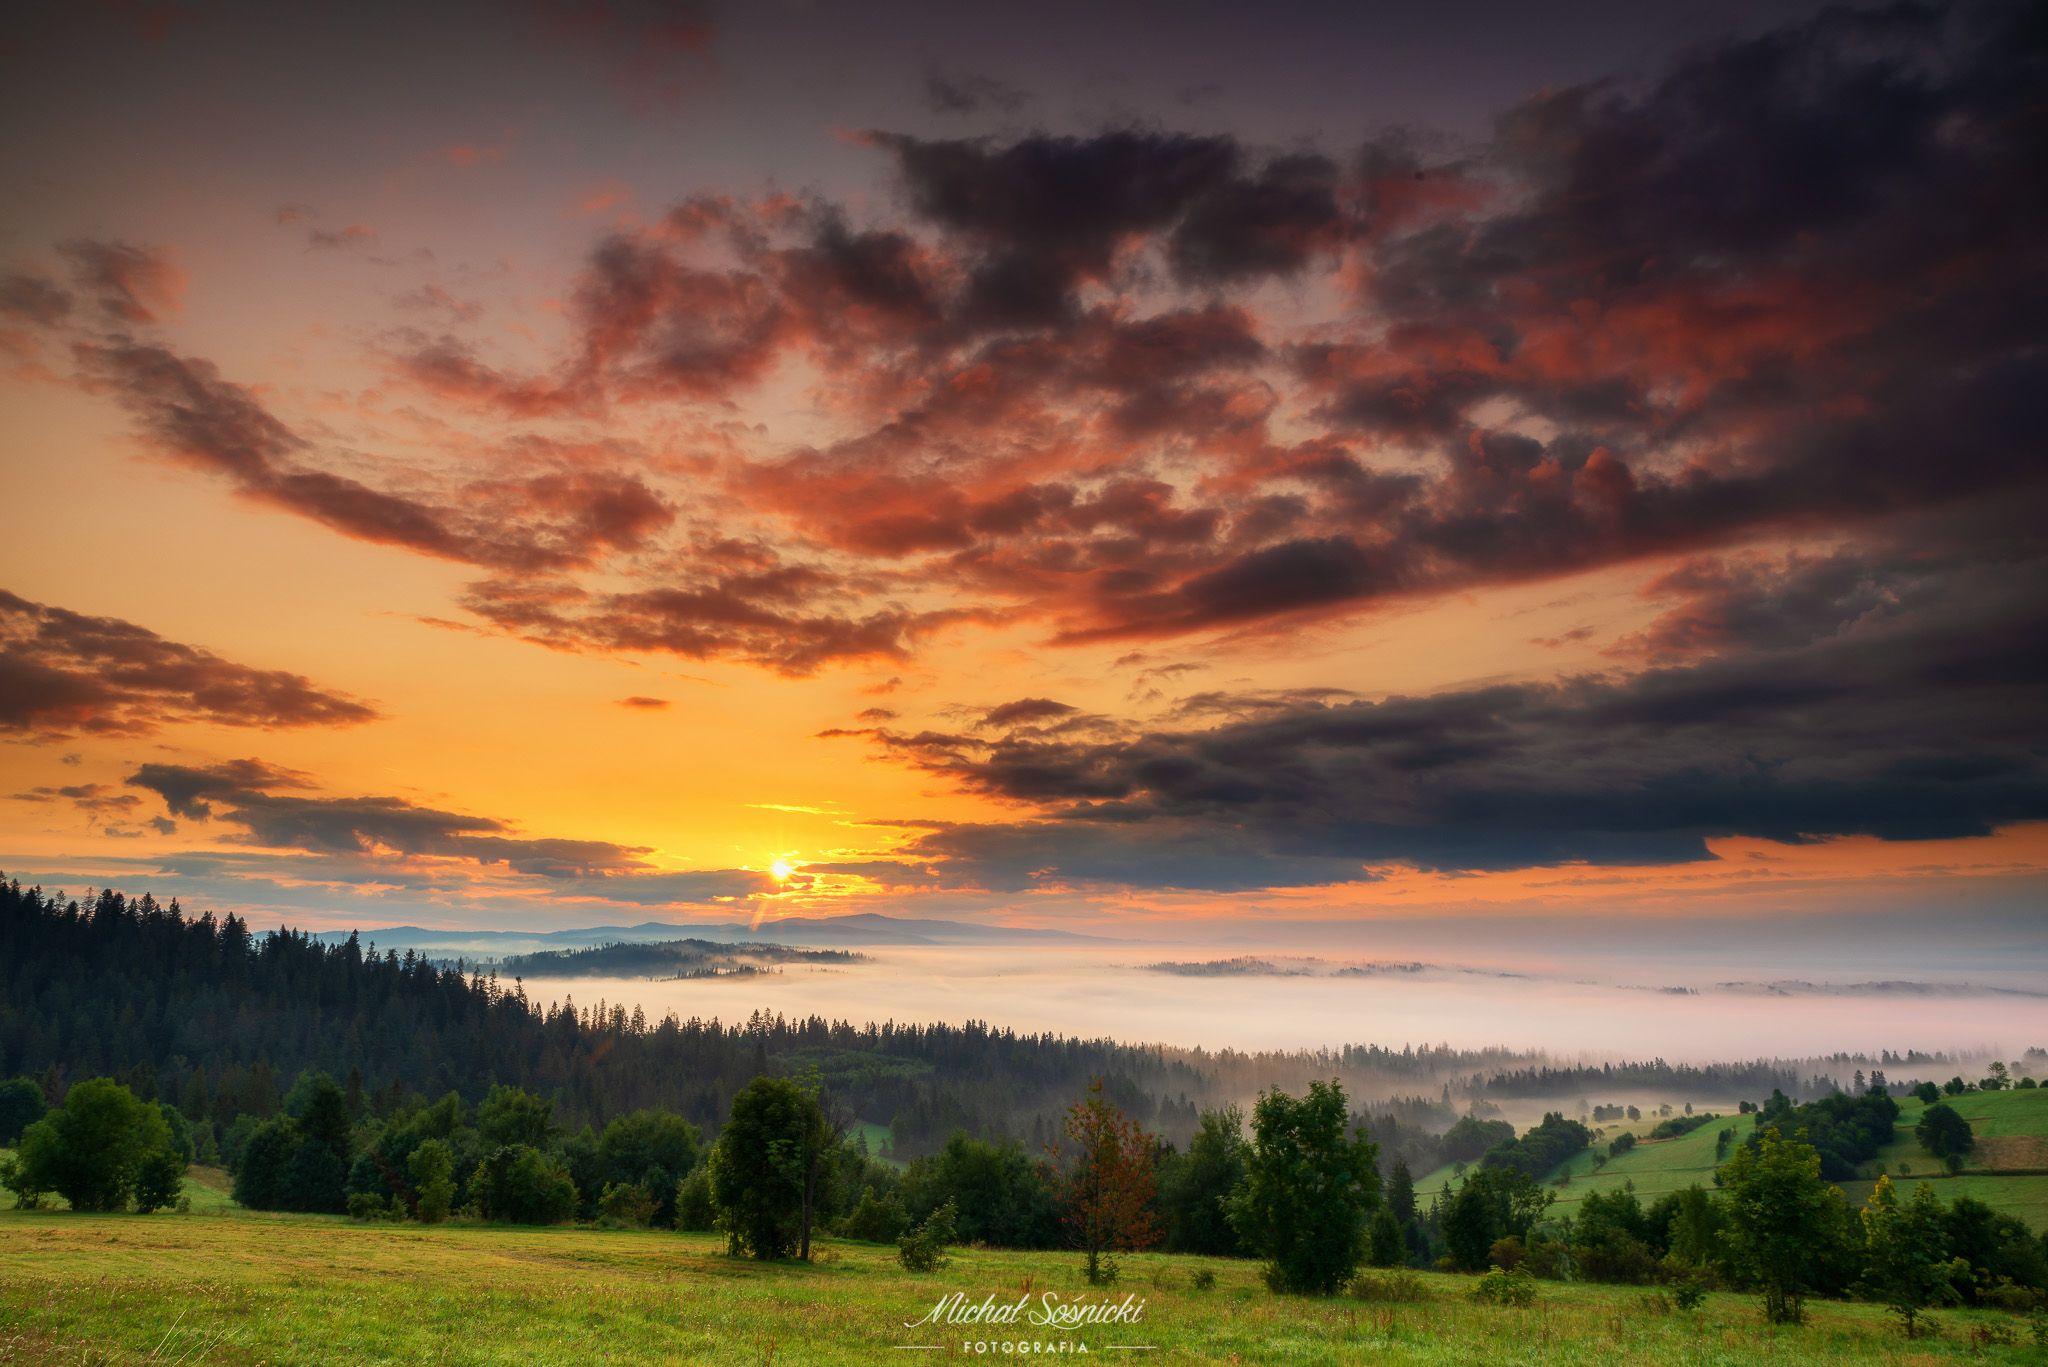 #poland #pentax #benro #lightroom #nikcollection #nature #sunrise #mountains #sky #fog #foggy #morning #pix, Sośnicki Michał